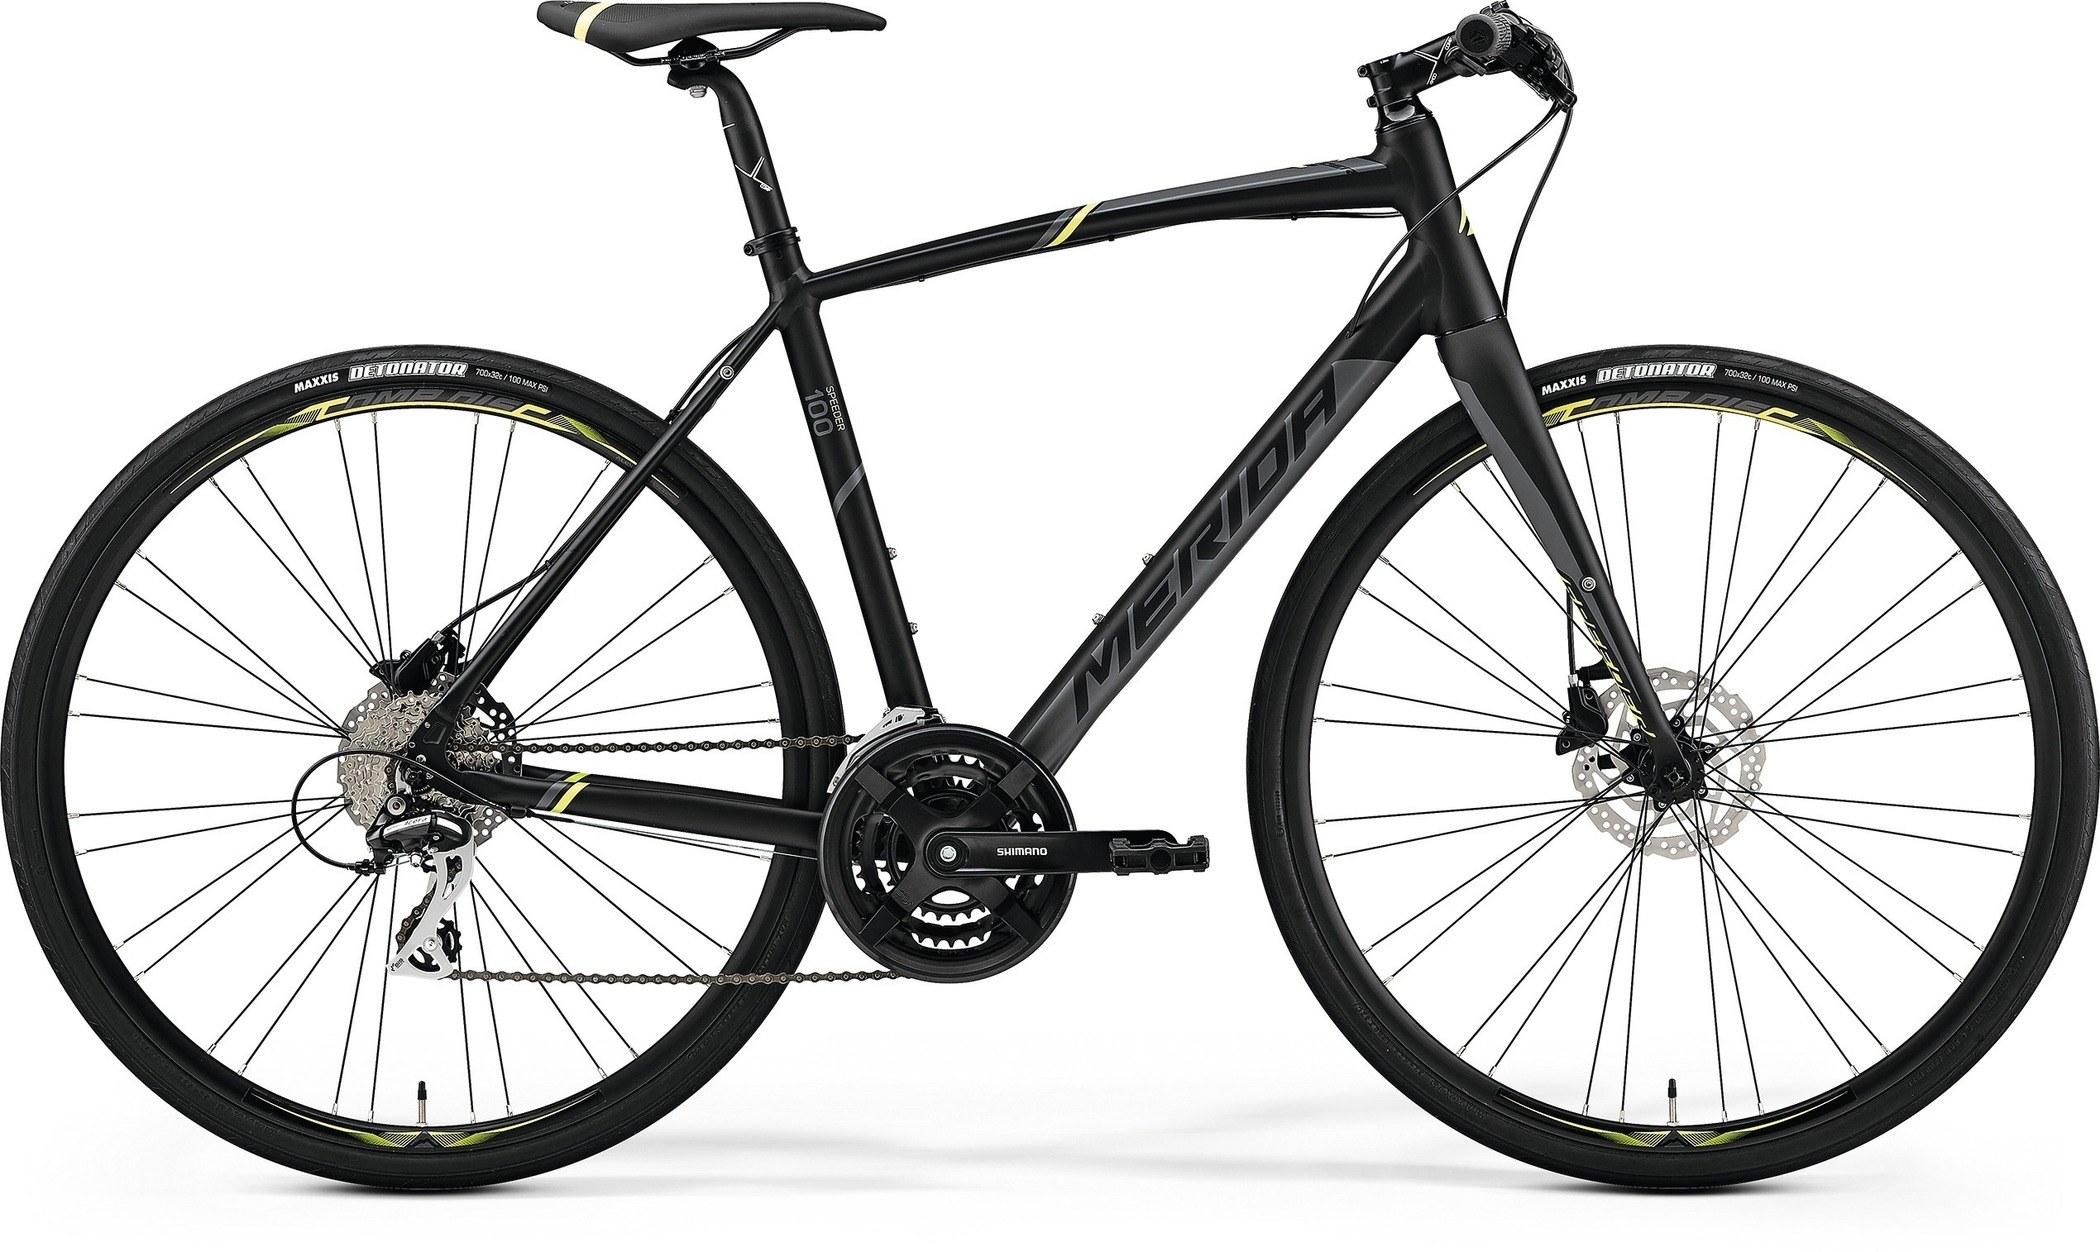 632ef4fdced 2019 Merida Speeder 100 Hybrid Bike Matt Black/Yellow/Grey £599.99